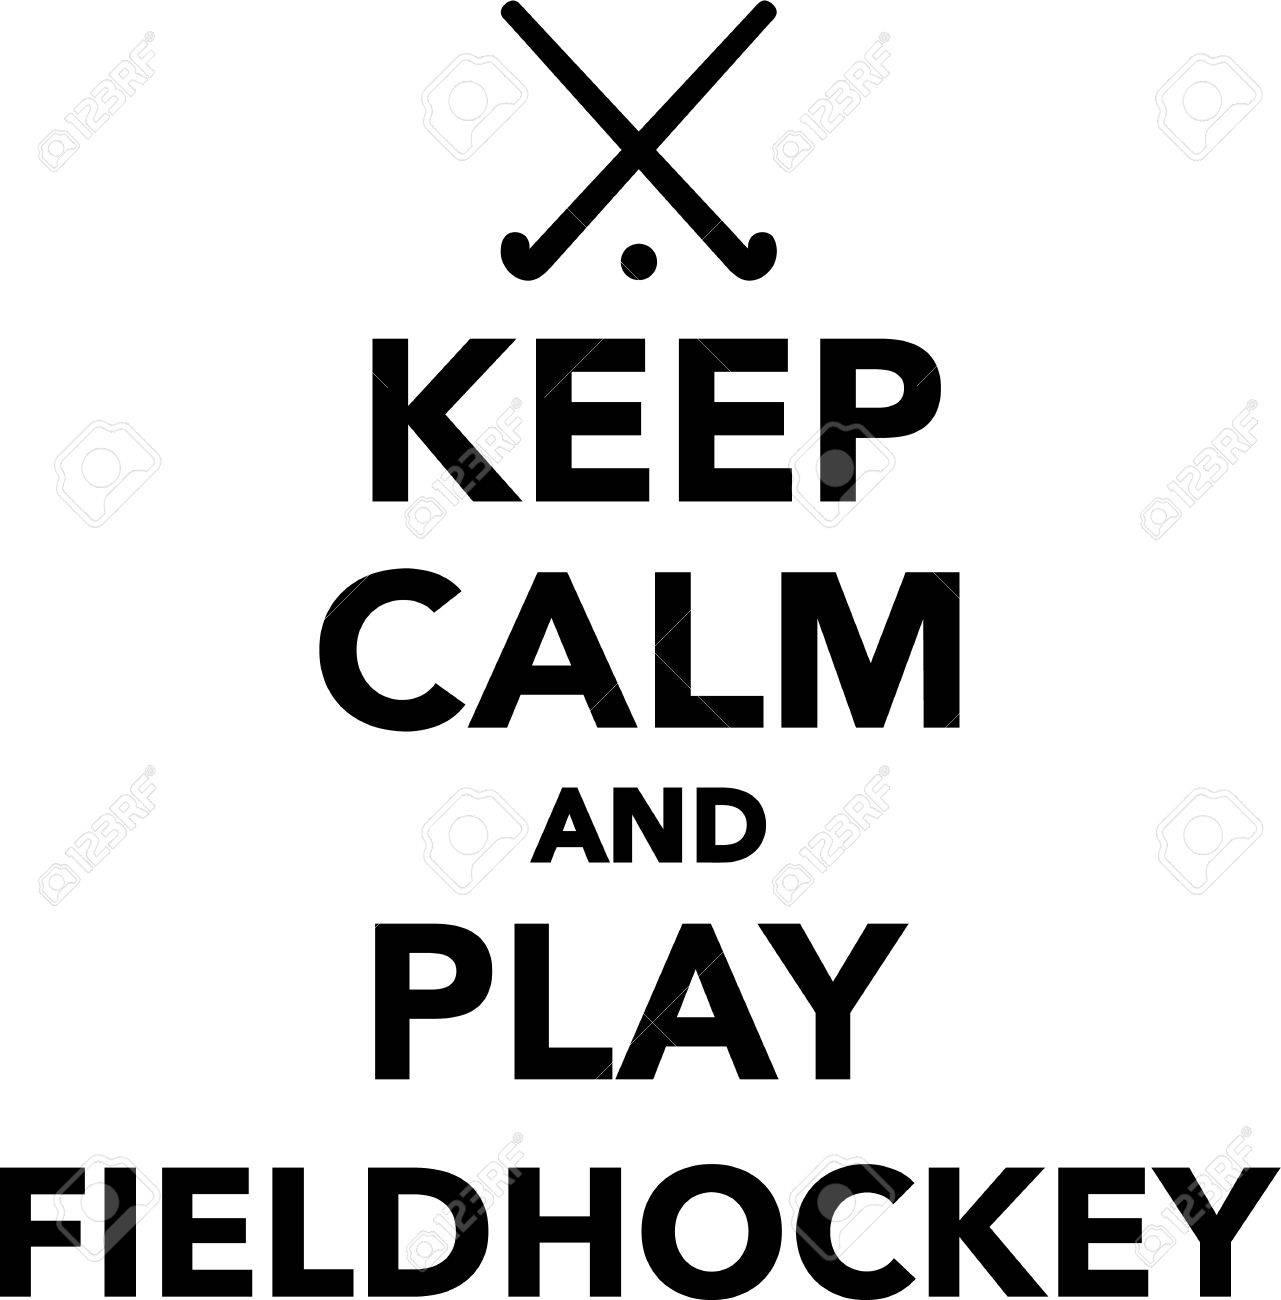 Keep Calm and play field hockey - 40900893